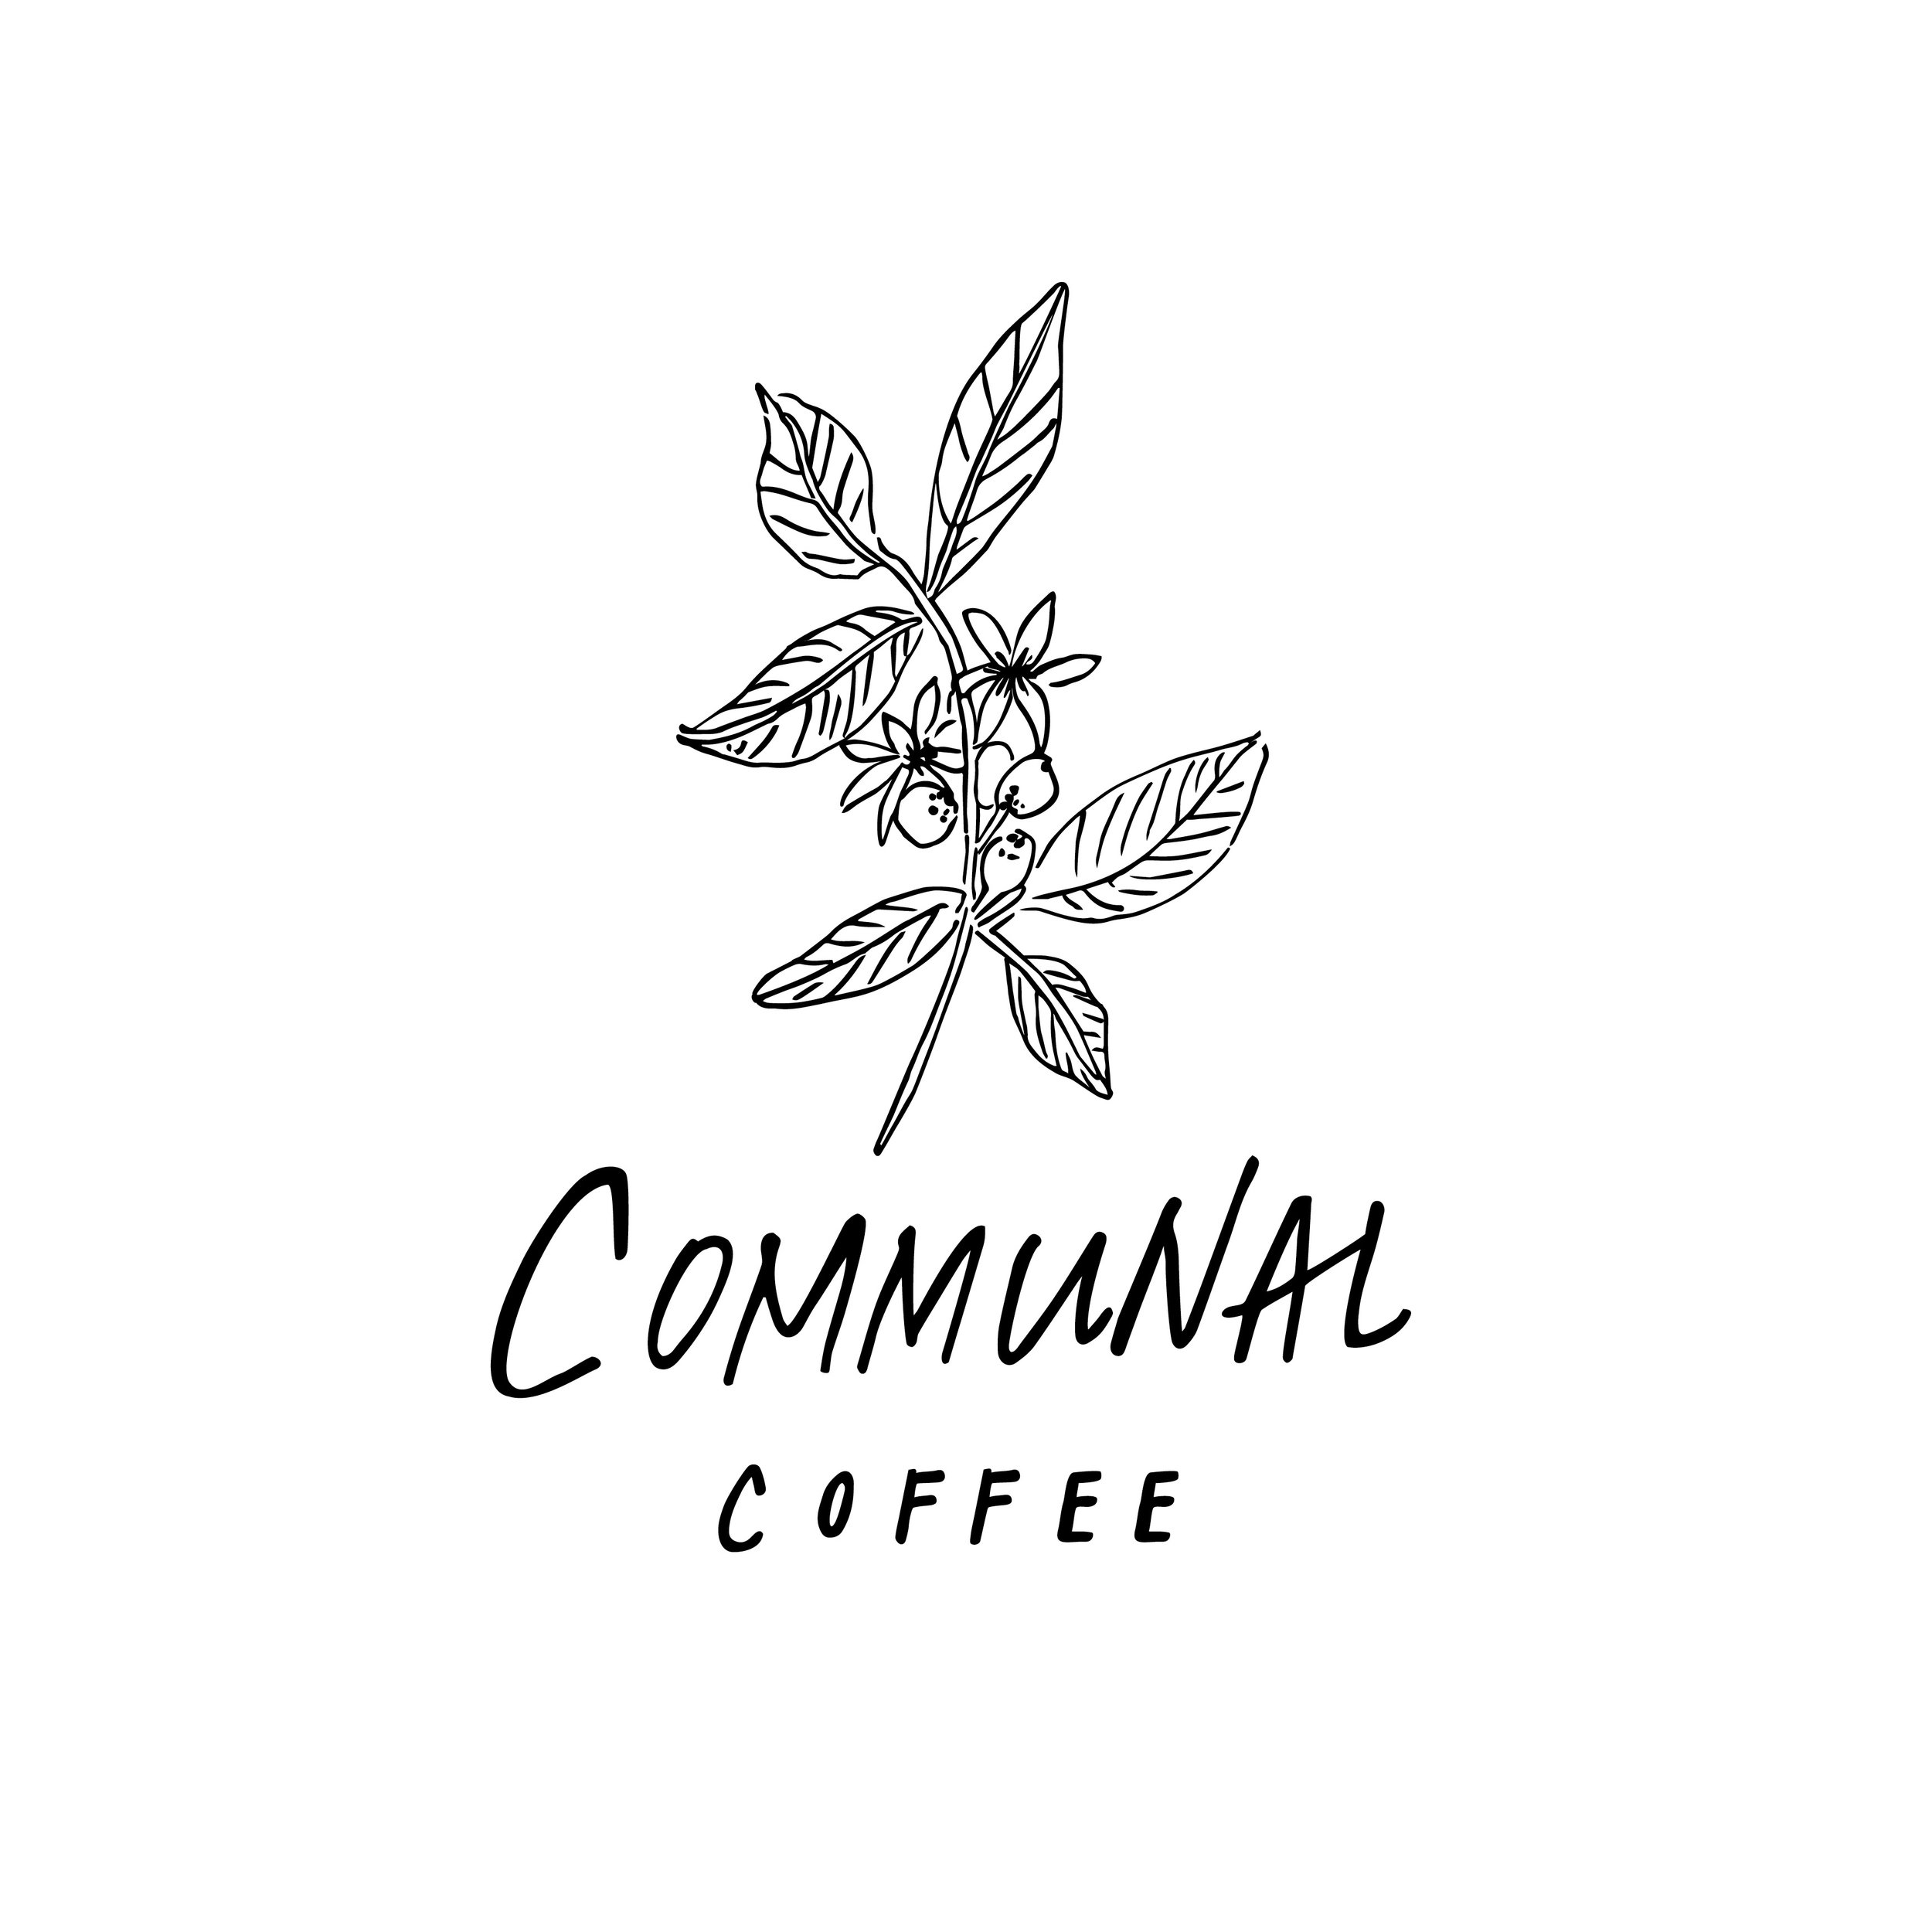 communal_coffee_logoandillustration.jpg